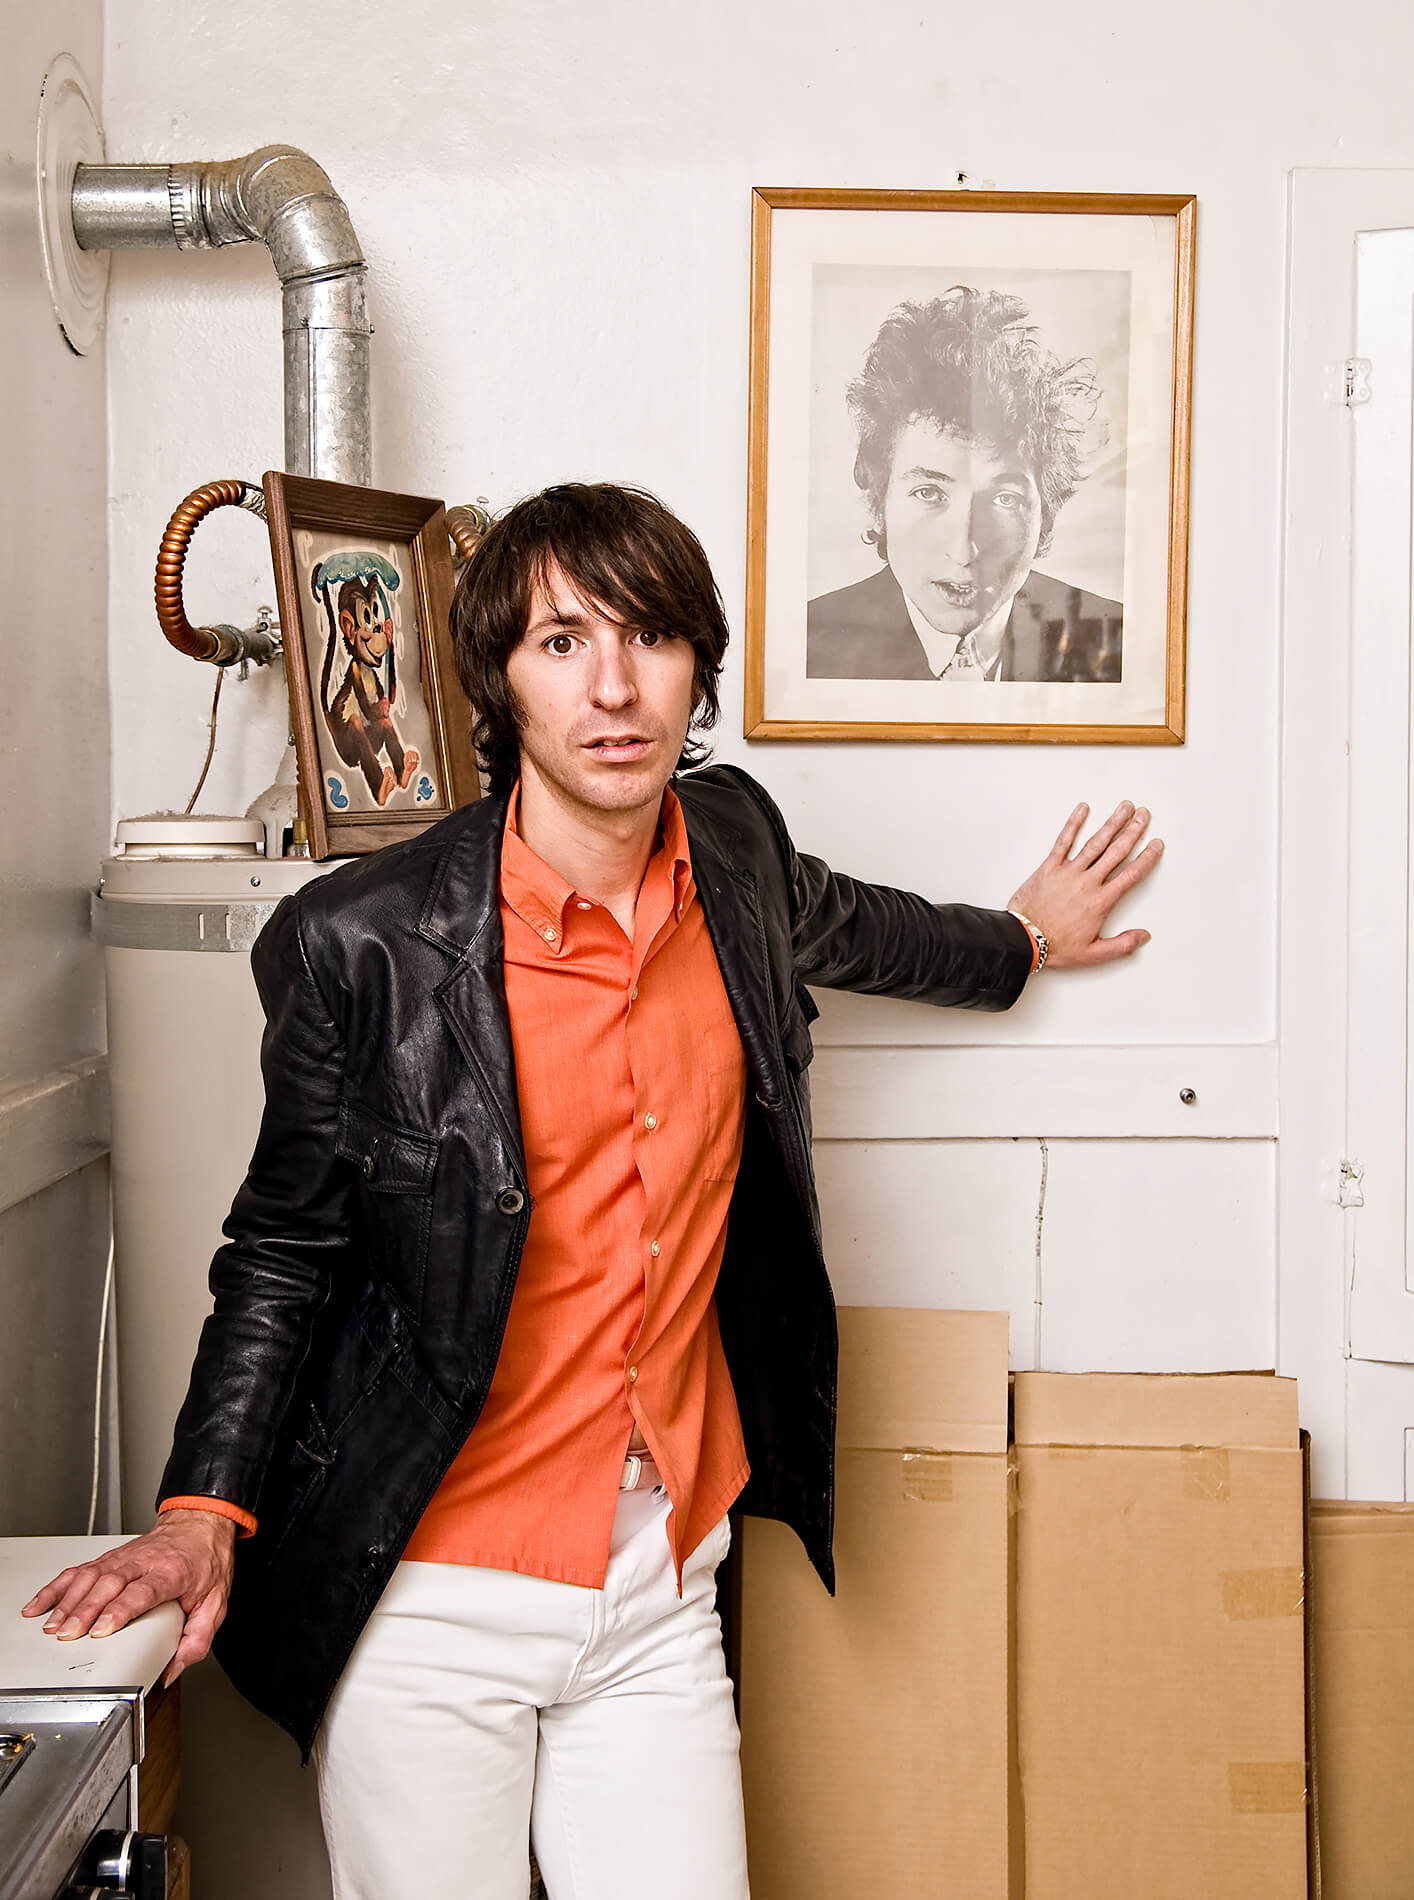 Bart Davenport with Bob Dylan portrait